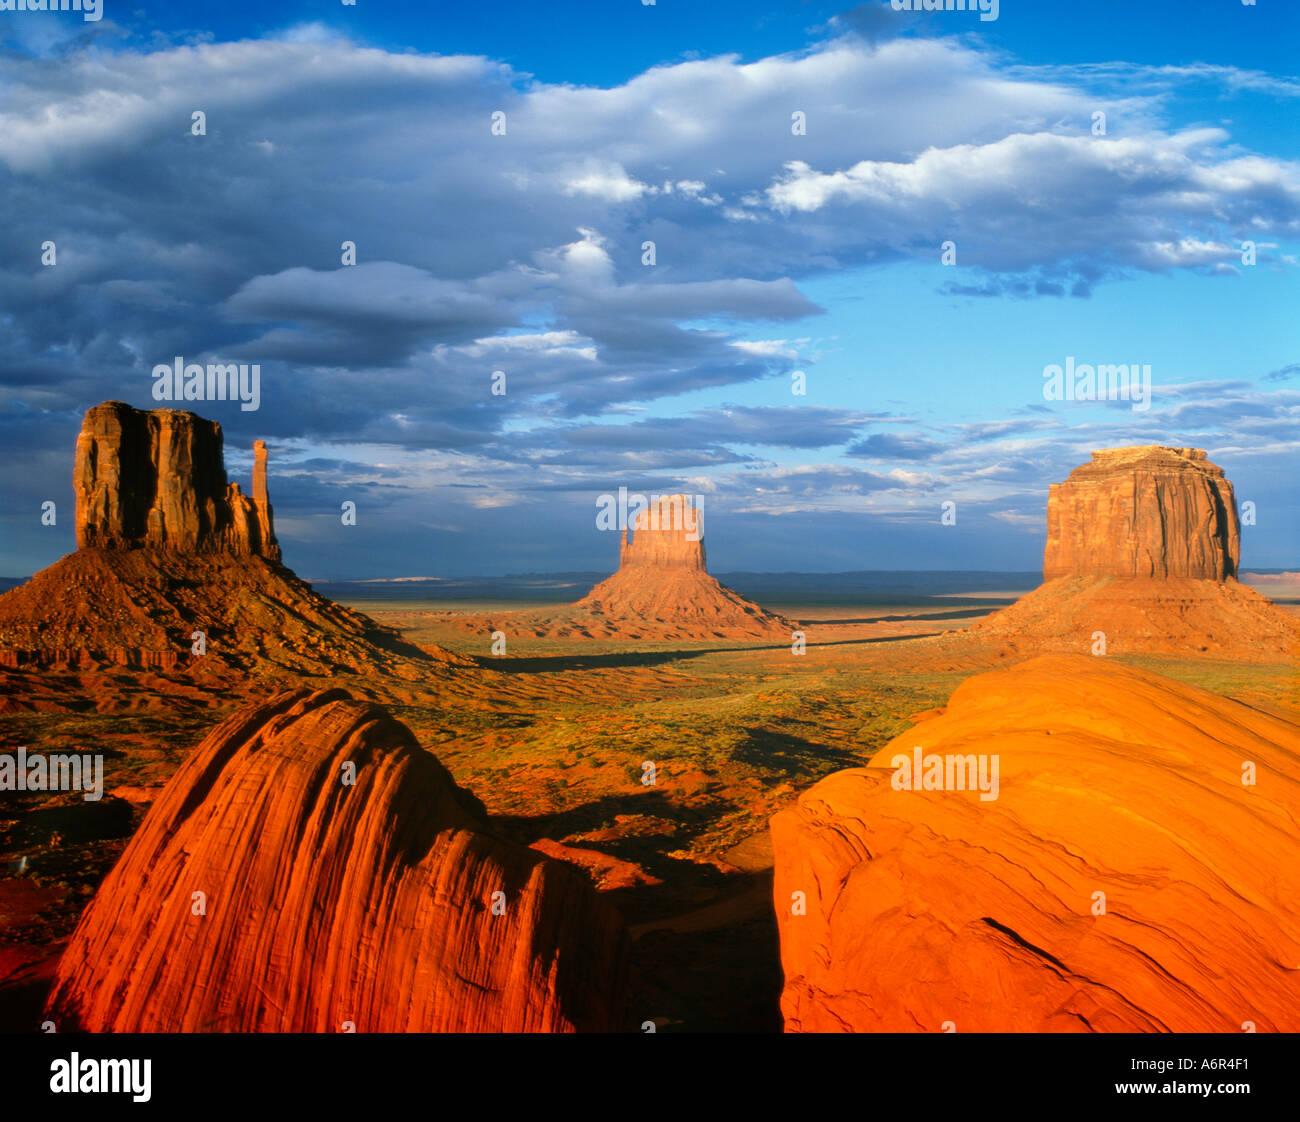 Mitten Buttes Monument Valley Arizona USA - Stock Image